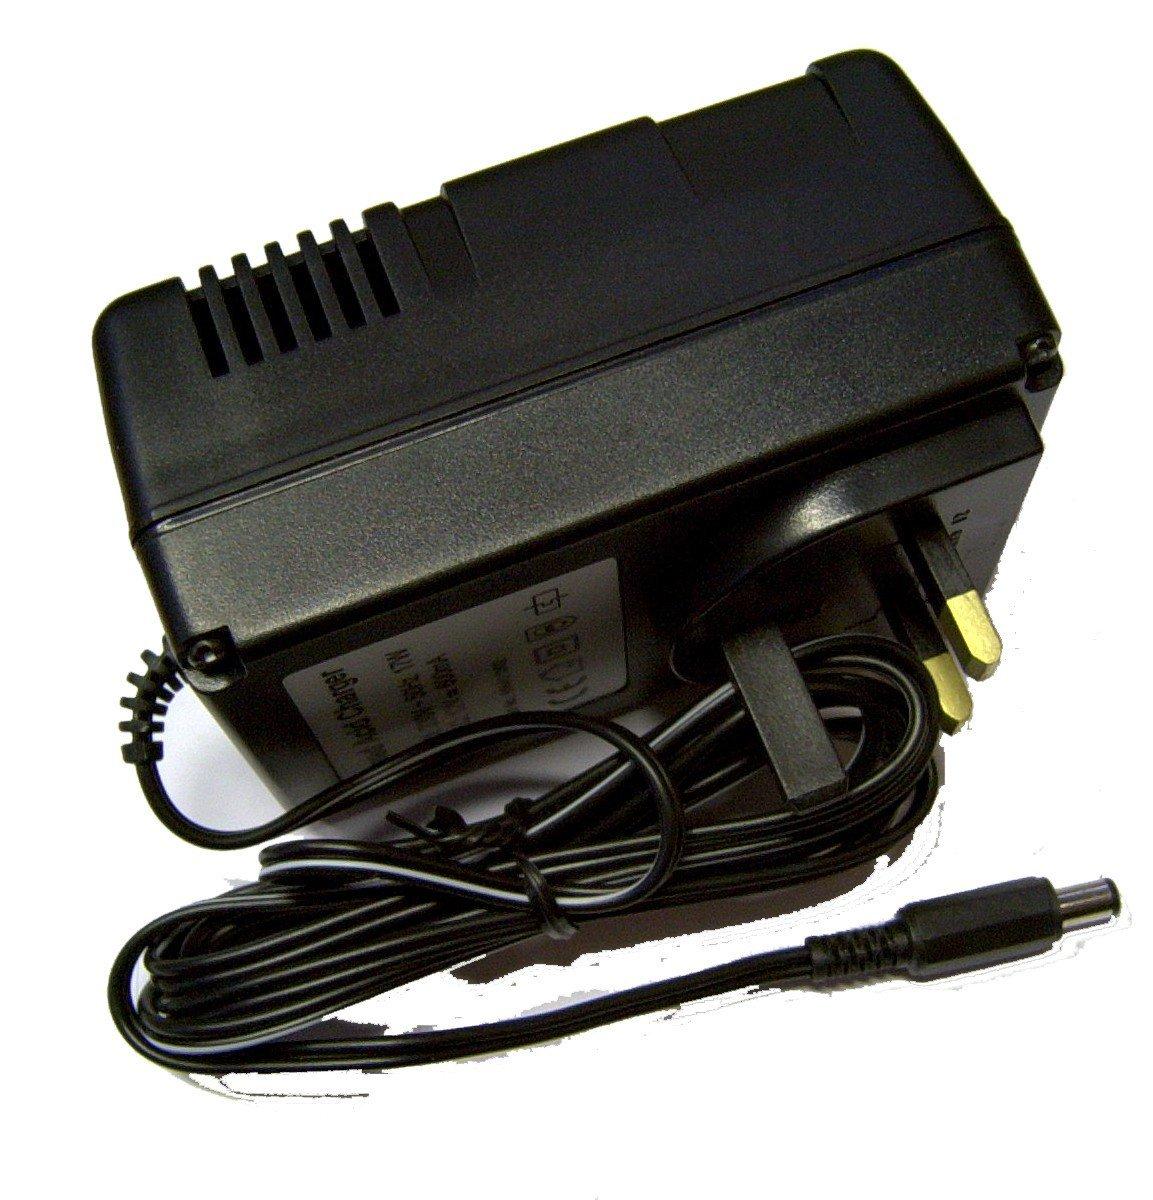 Philadelphia Scientific: HydroFill Charger 3-Pin UK 220VAC/12VDC 2.1mm